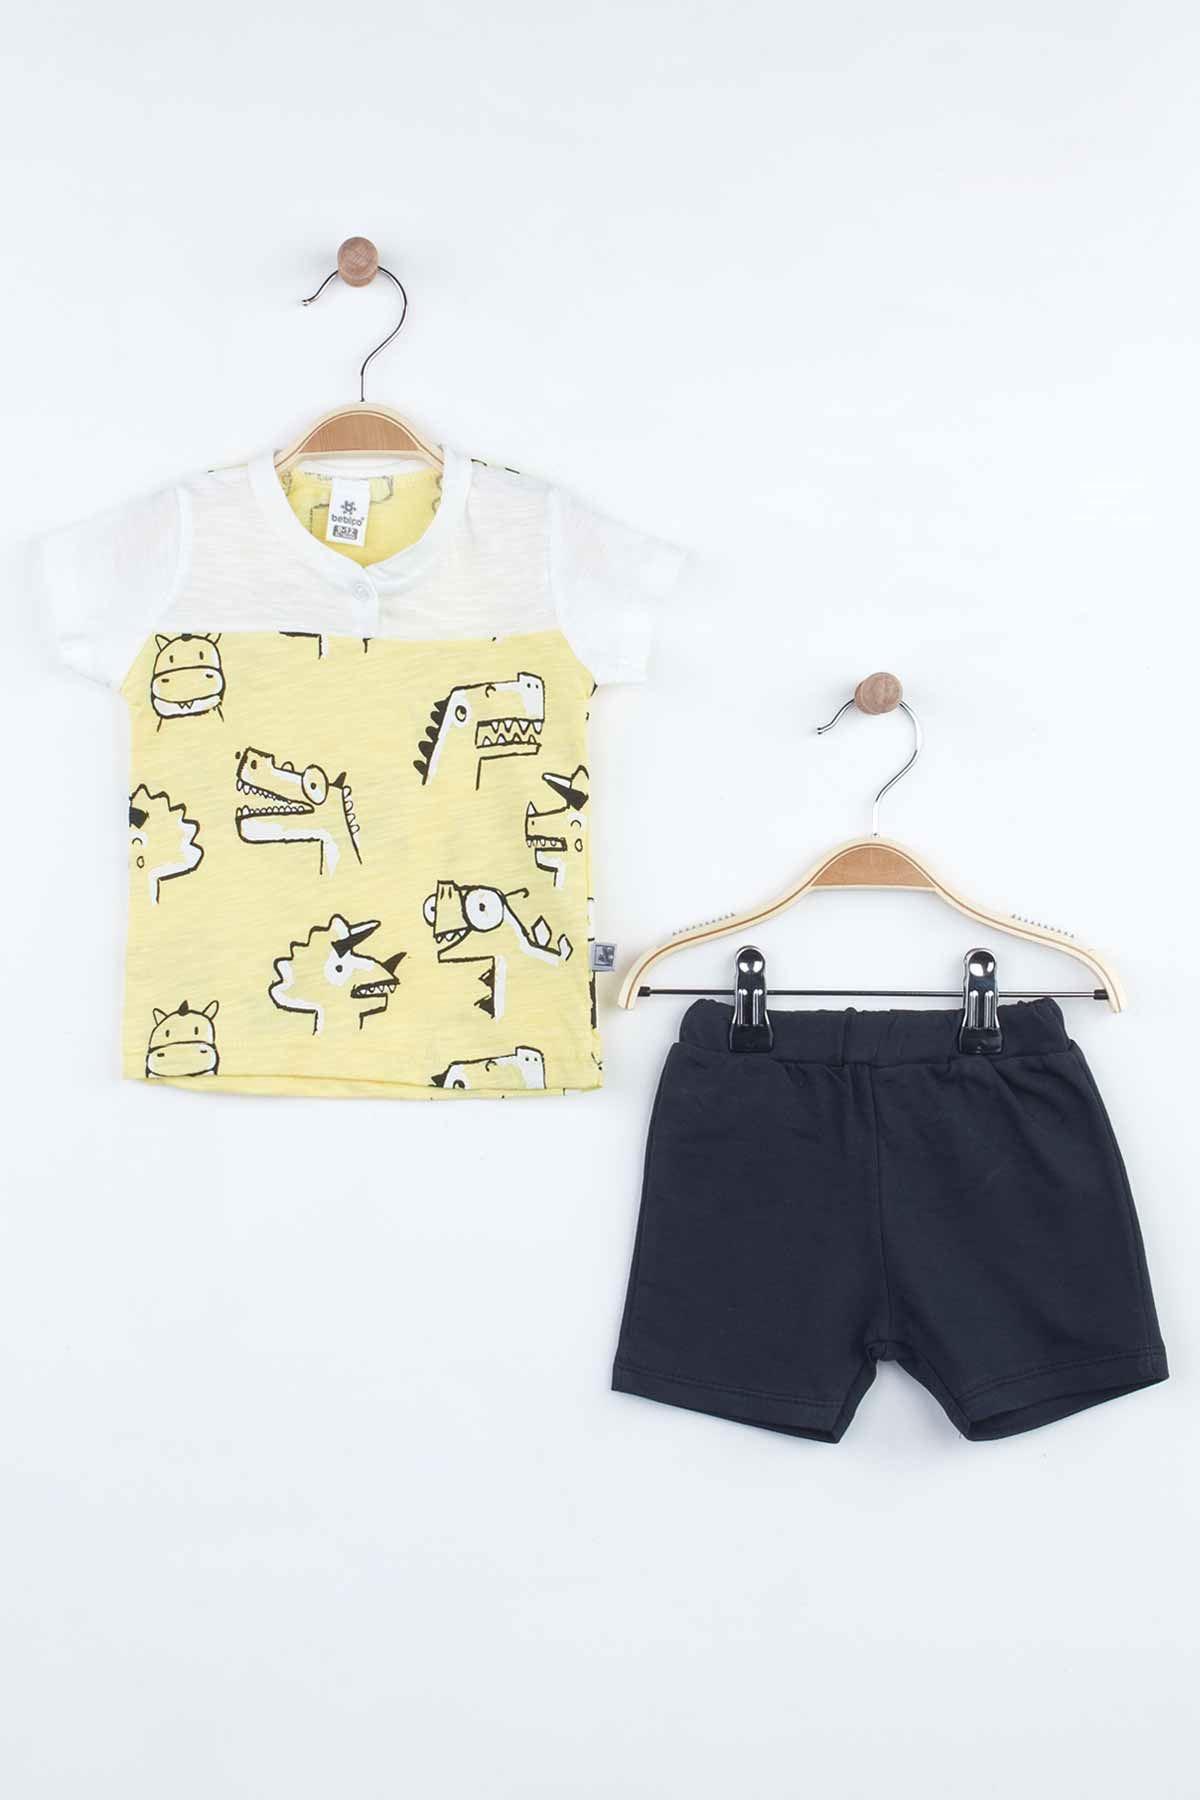 Yellow Summer Hot Baby Boy Shorts Set Summer 2021 Fashion Babies Boys Outfit Cotton Casual Vacation Use Clothing Models